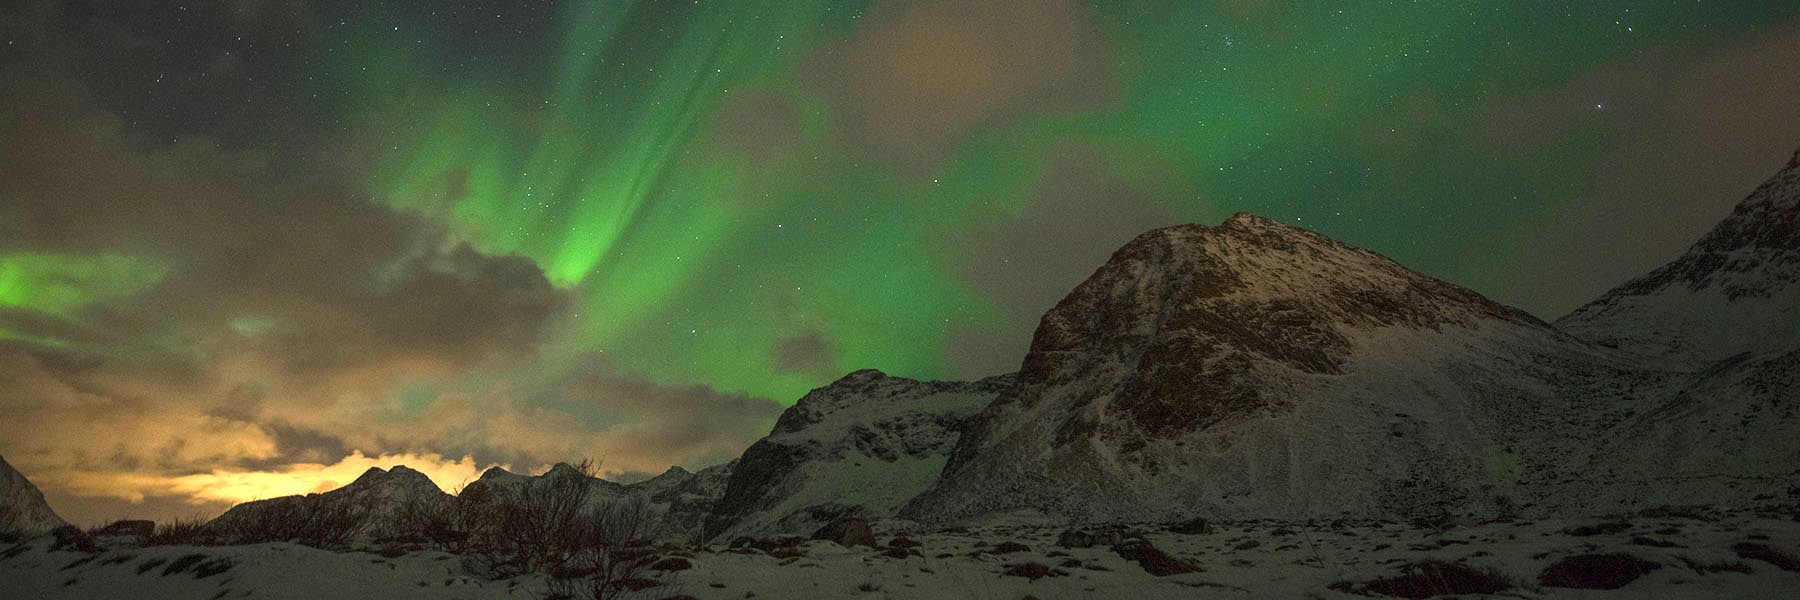 Chasing Northern Lights